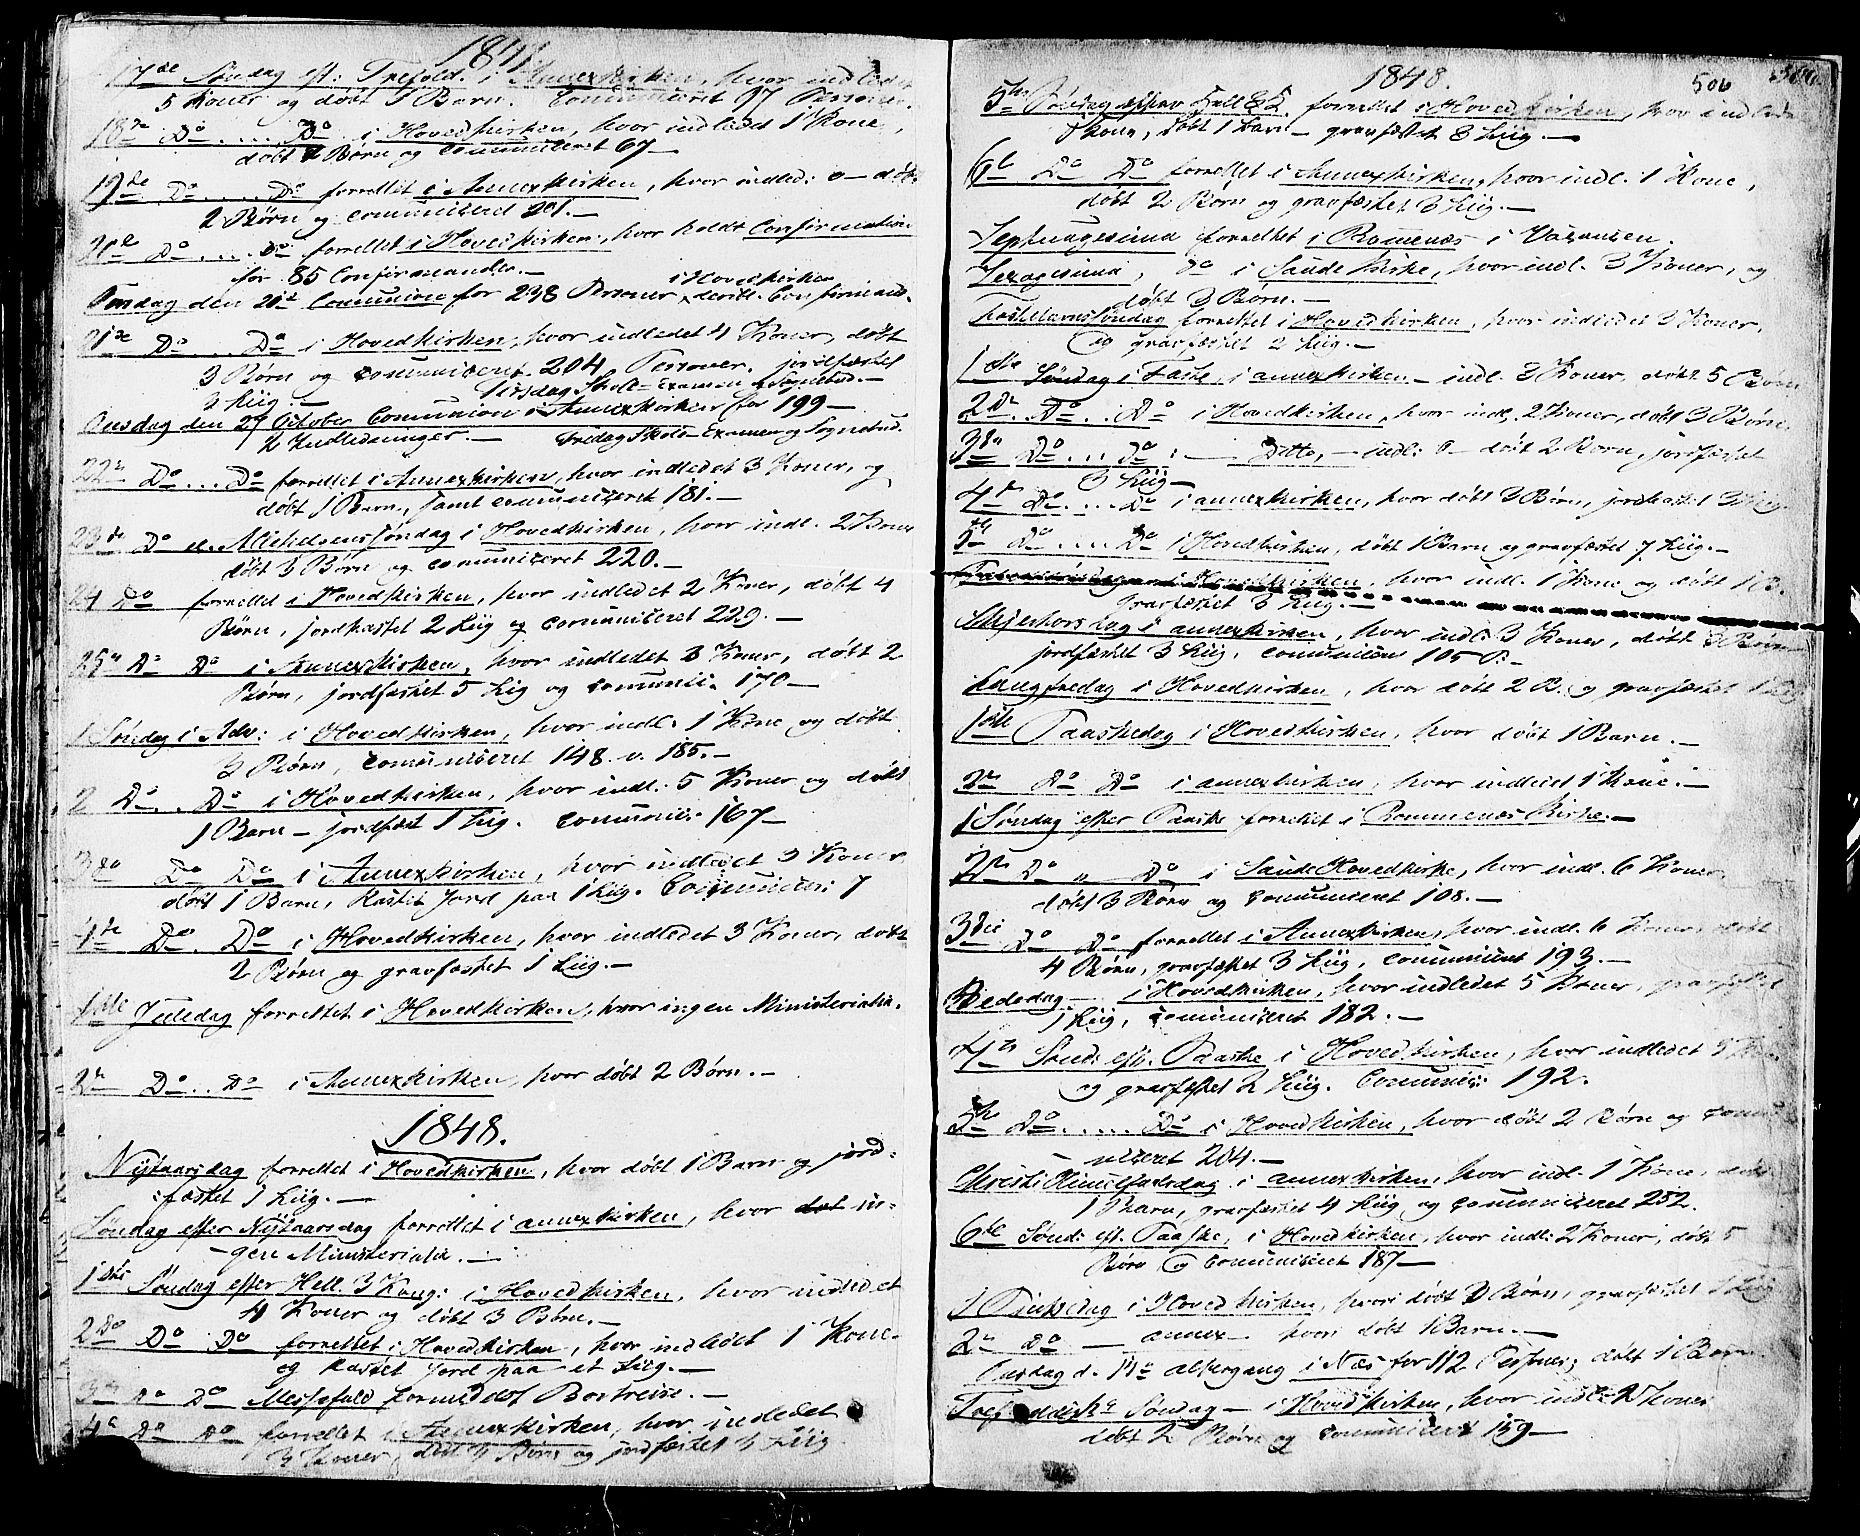 SAKO, Sauherad kirkebøker, F/Fa/L0006: Ministerialbok nr. I 6, 1827-1850, s. 506